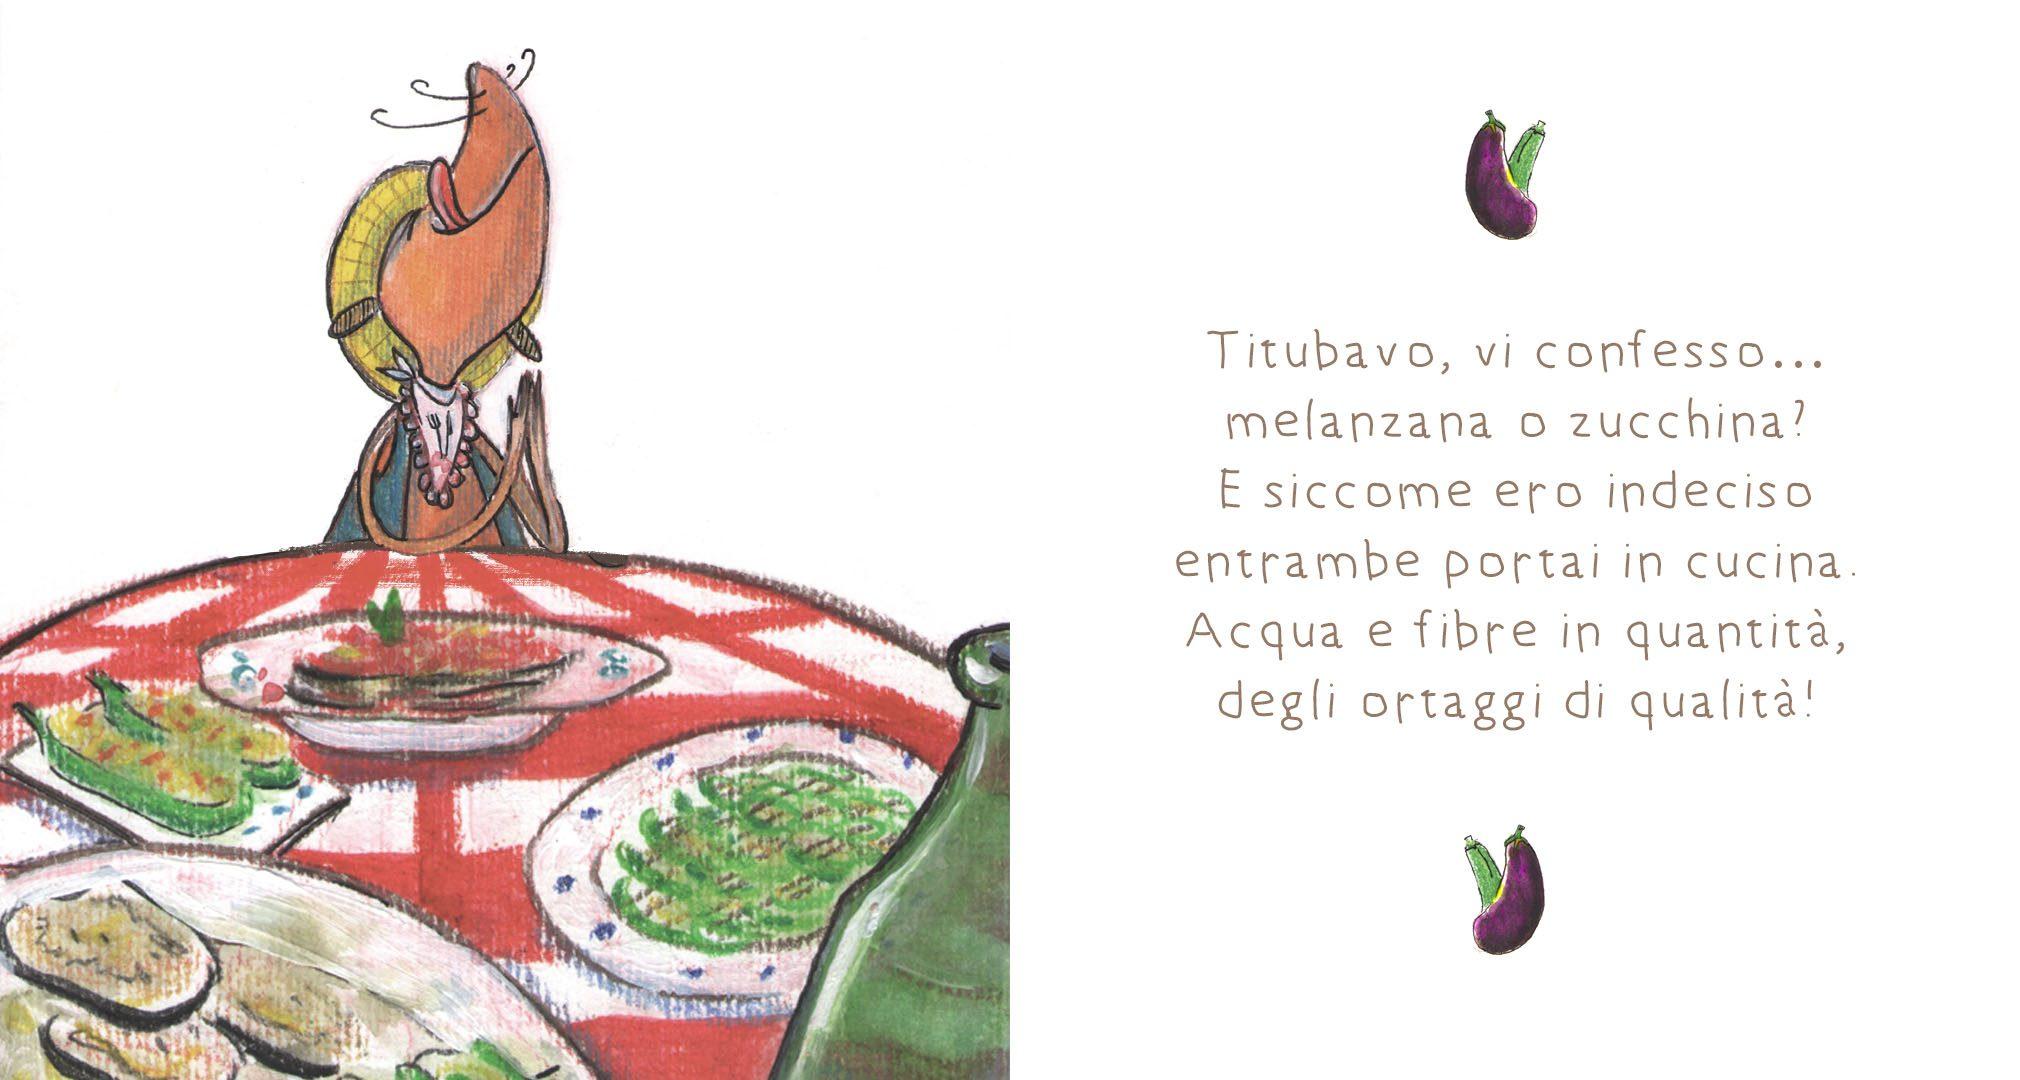 Vico8